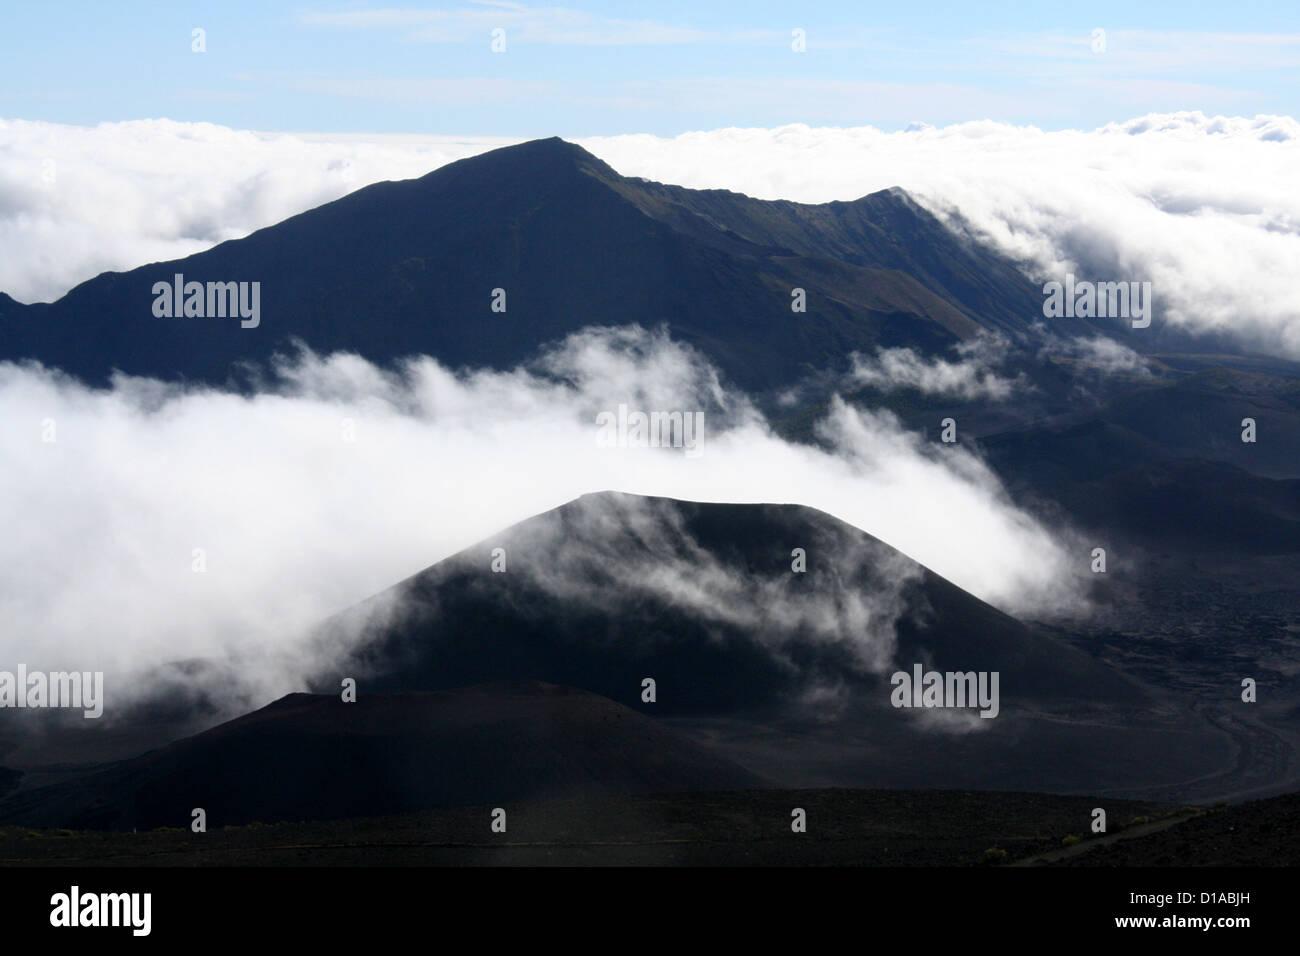 Fog and clouds among the cinder cones on Haleakala volcano, Maui, Hawaii Stock Photo